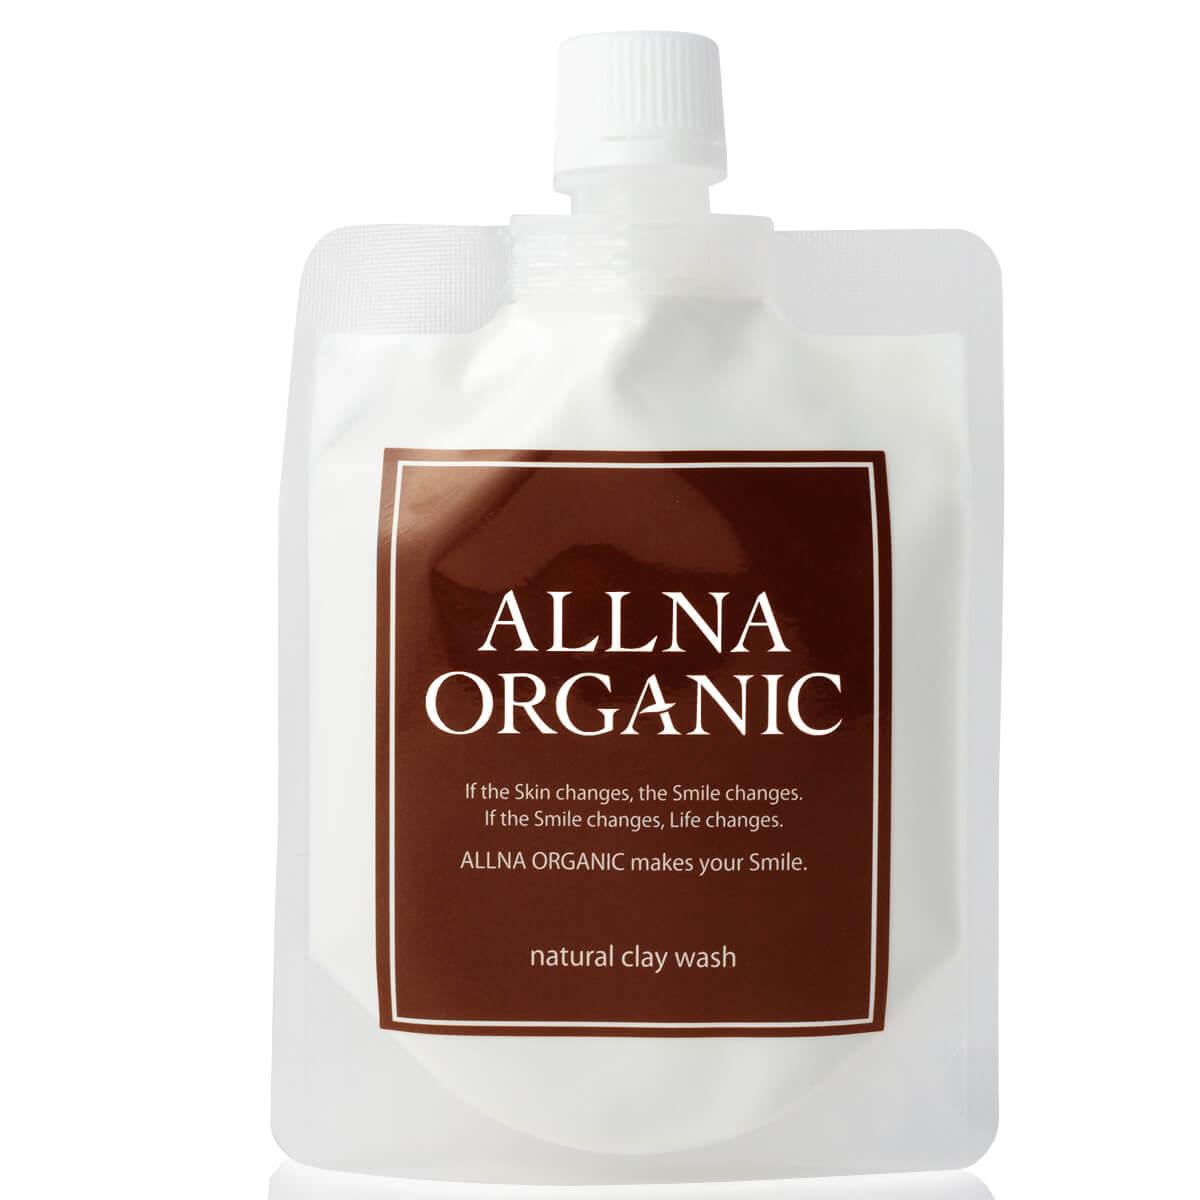 https://www.allna.jp/product/skincare/images/img_mud_washing.jpg